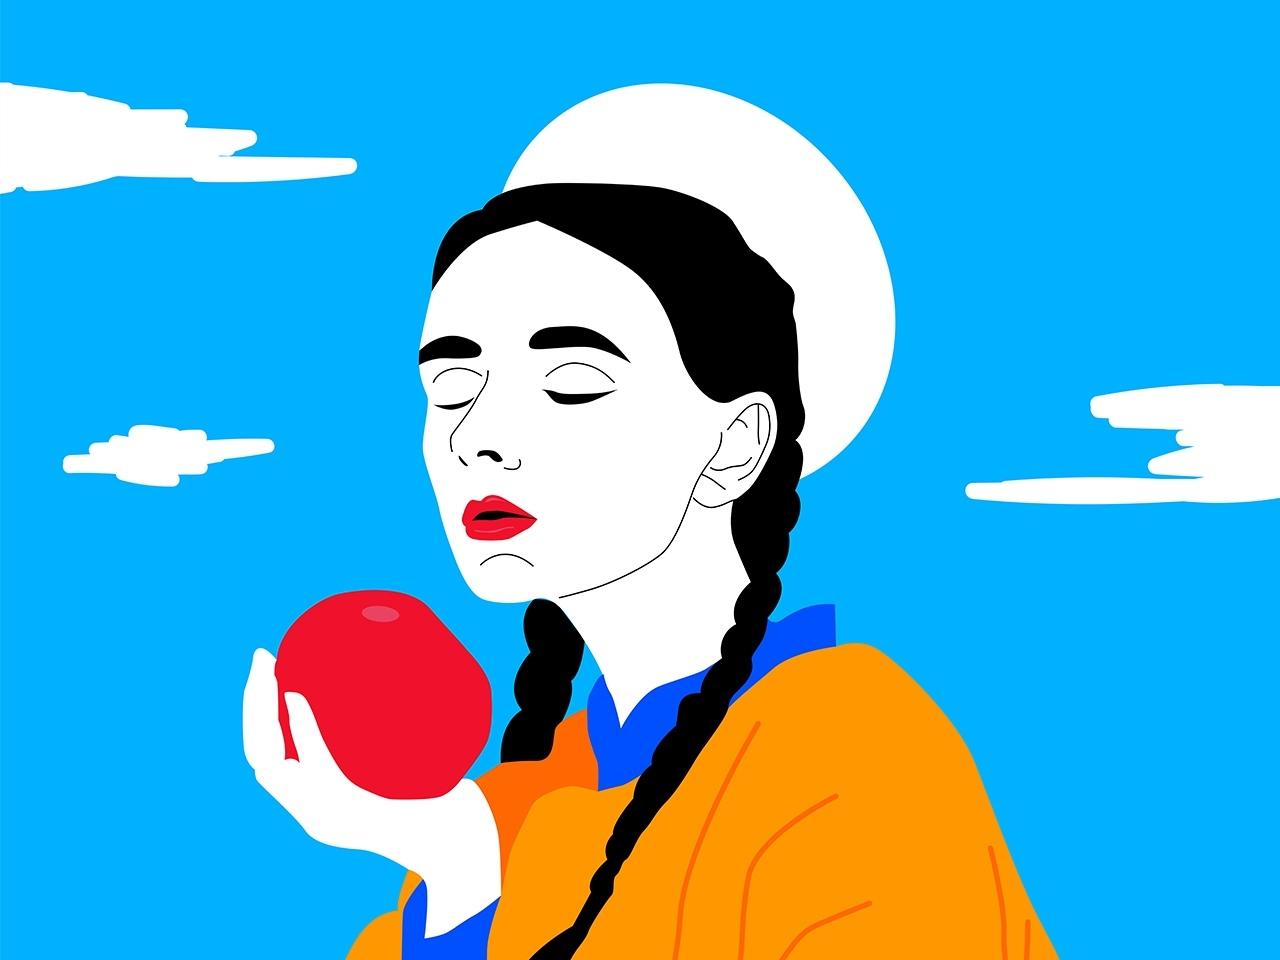 Anna sky girl aple color digitalart art illustraion disign